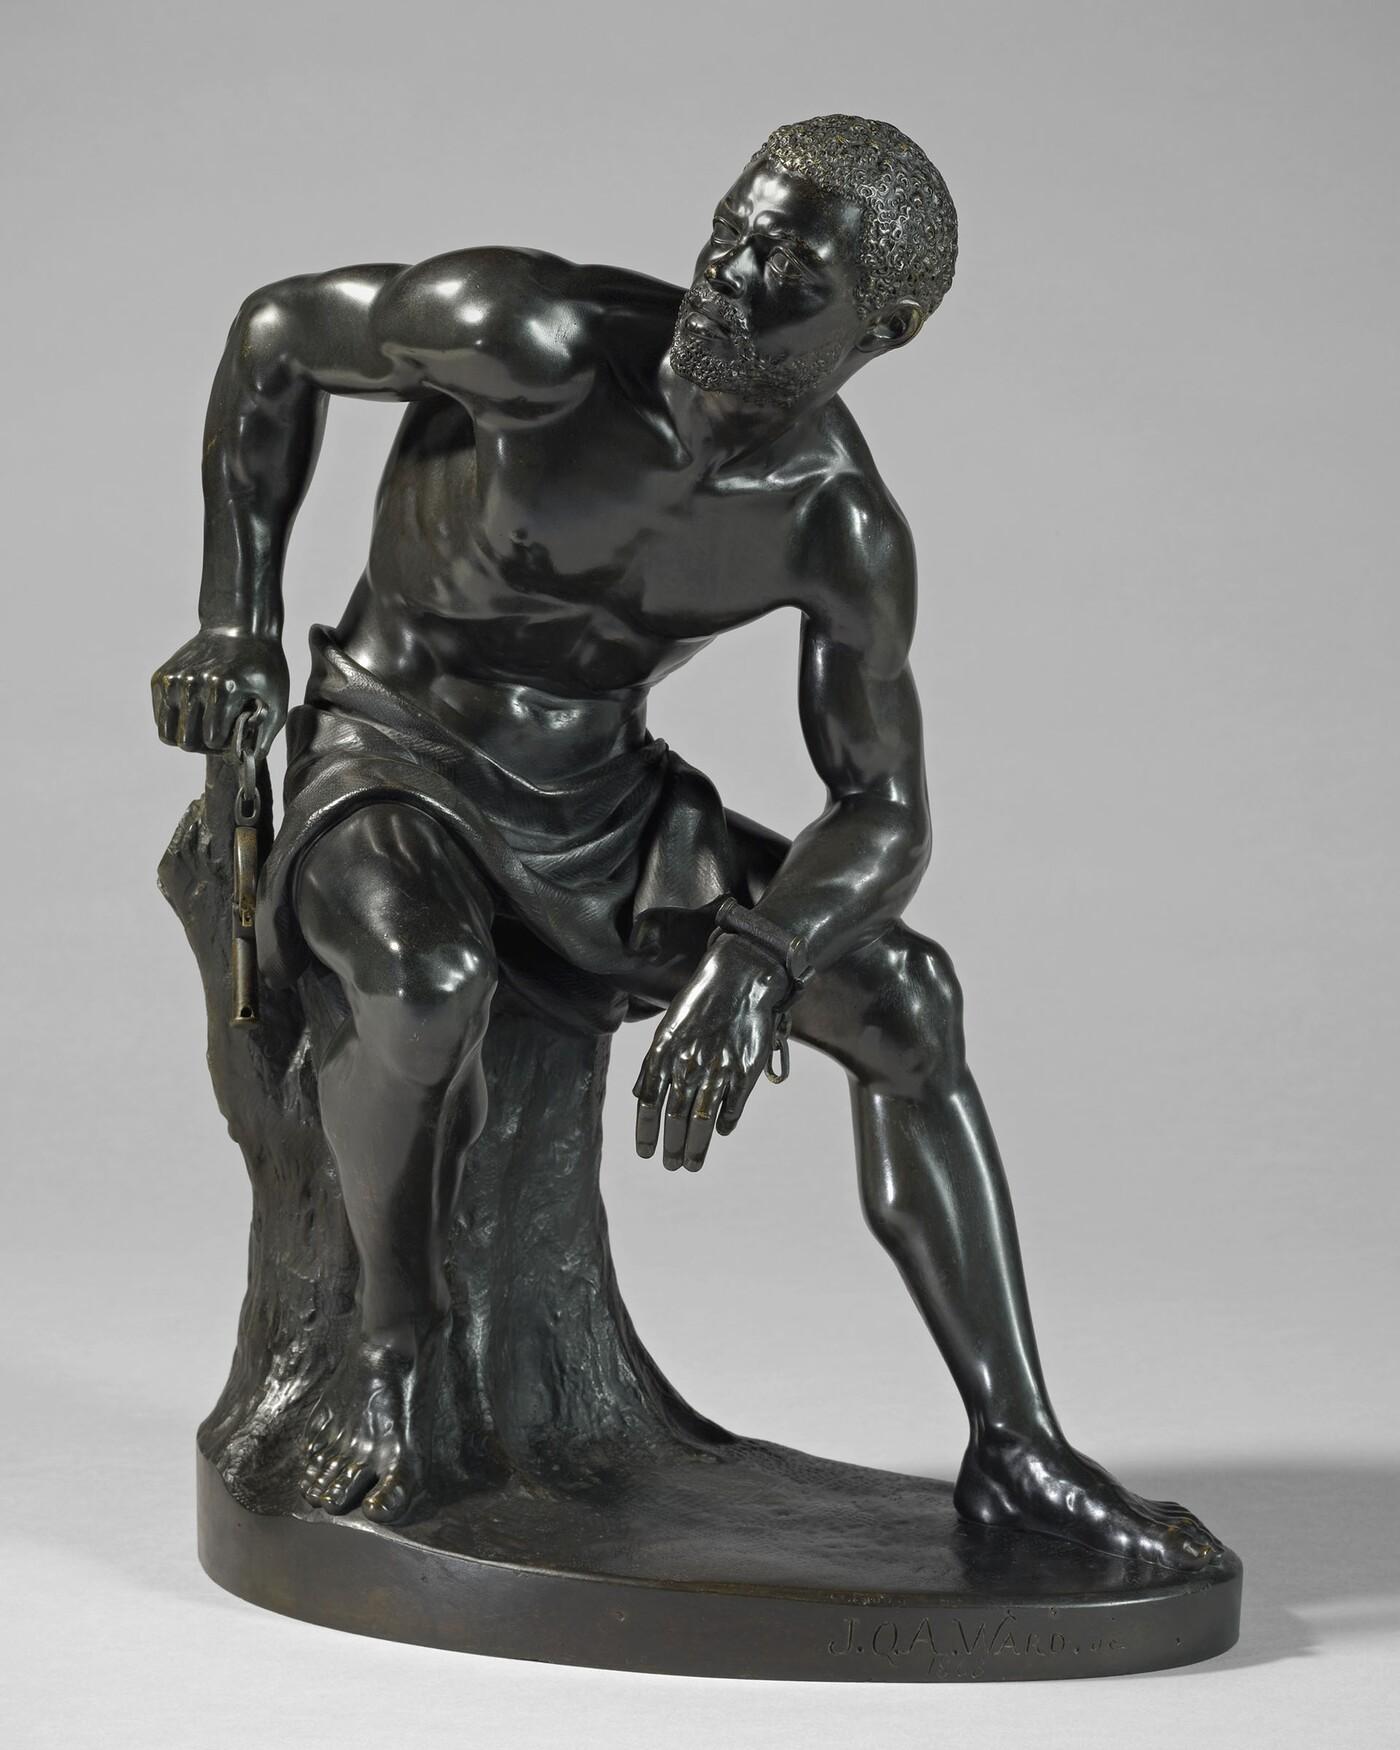 John Quincy Adams Ward (1830–1910), The Freedman, 1863, Bronze